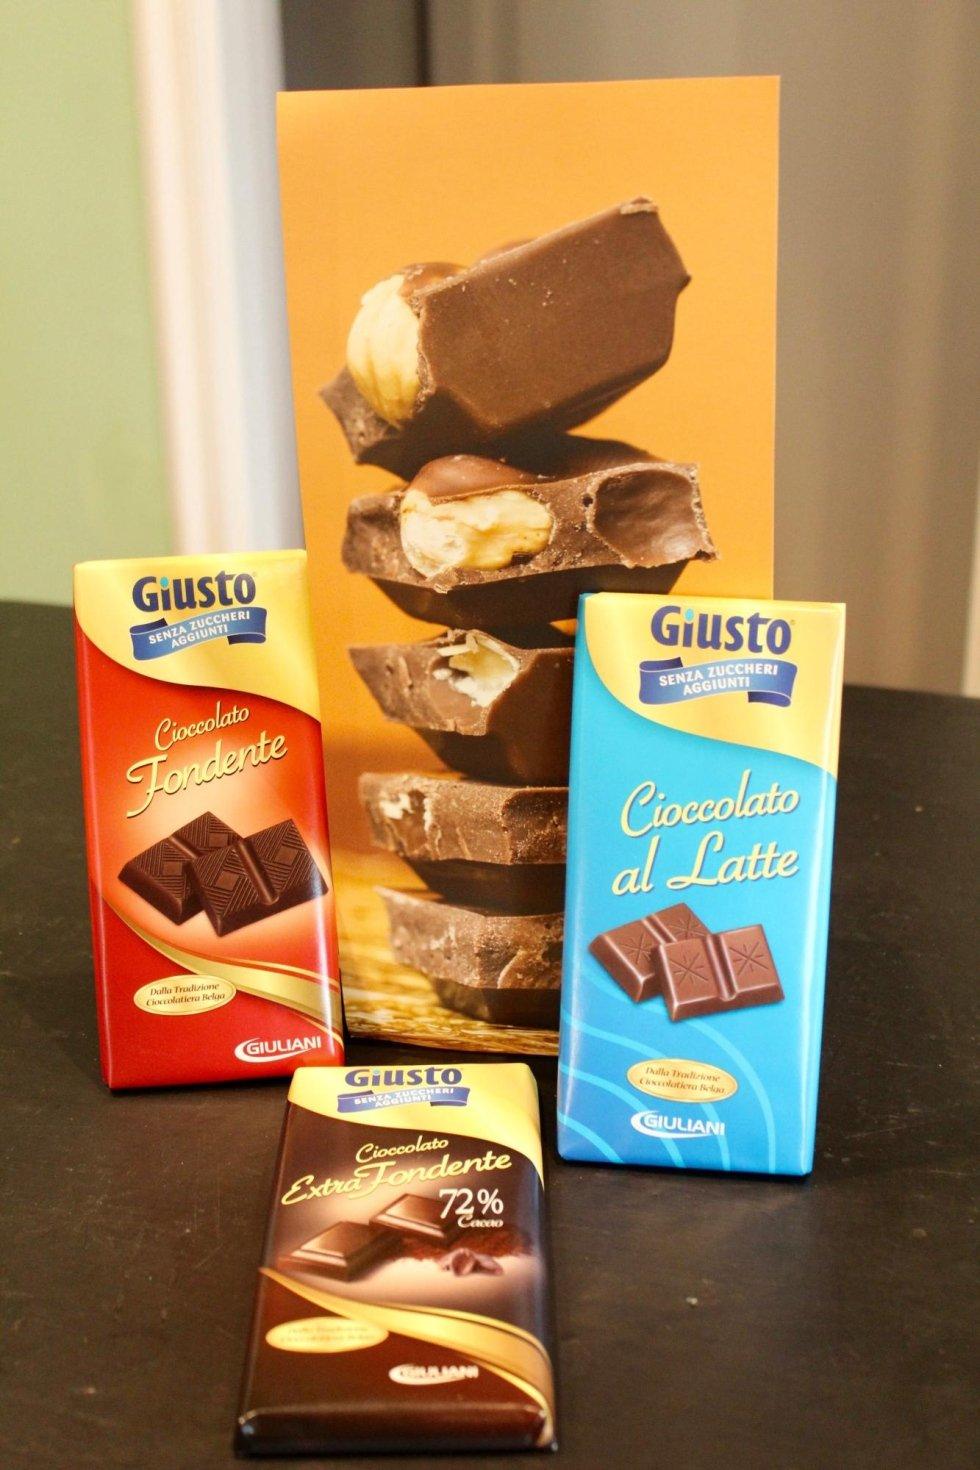 Cioccolata senza zucchero